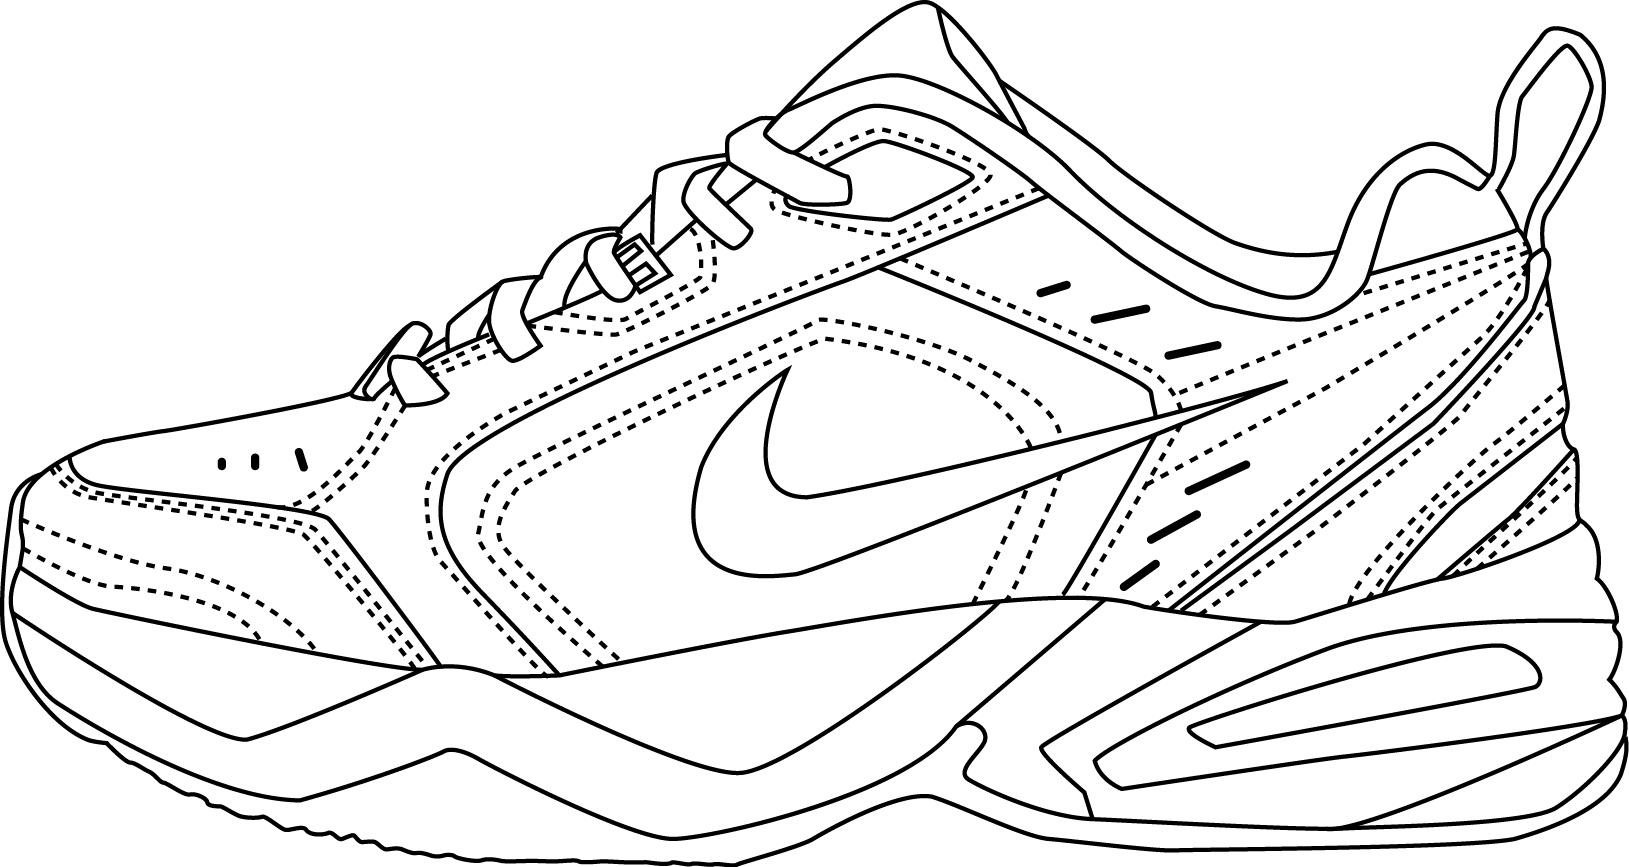 I will convert image to line art vector illustration